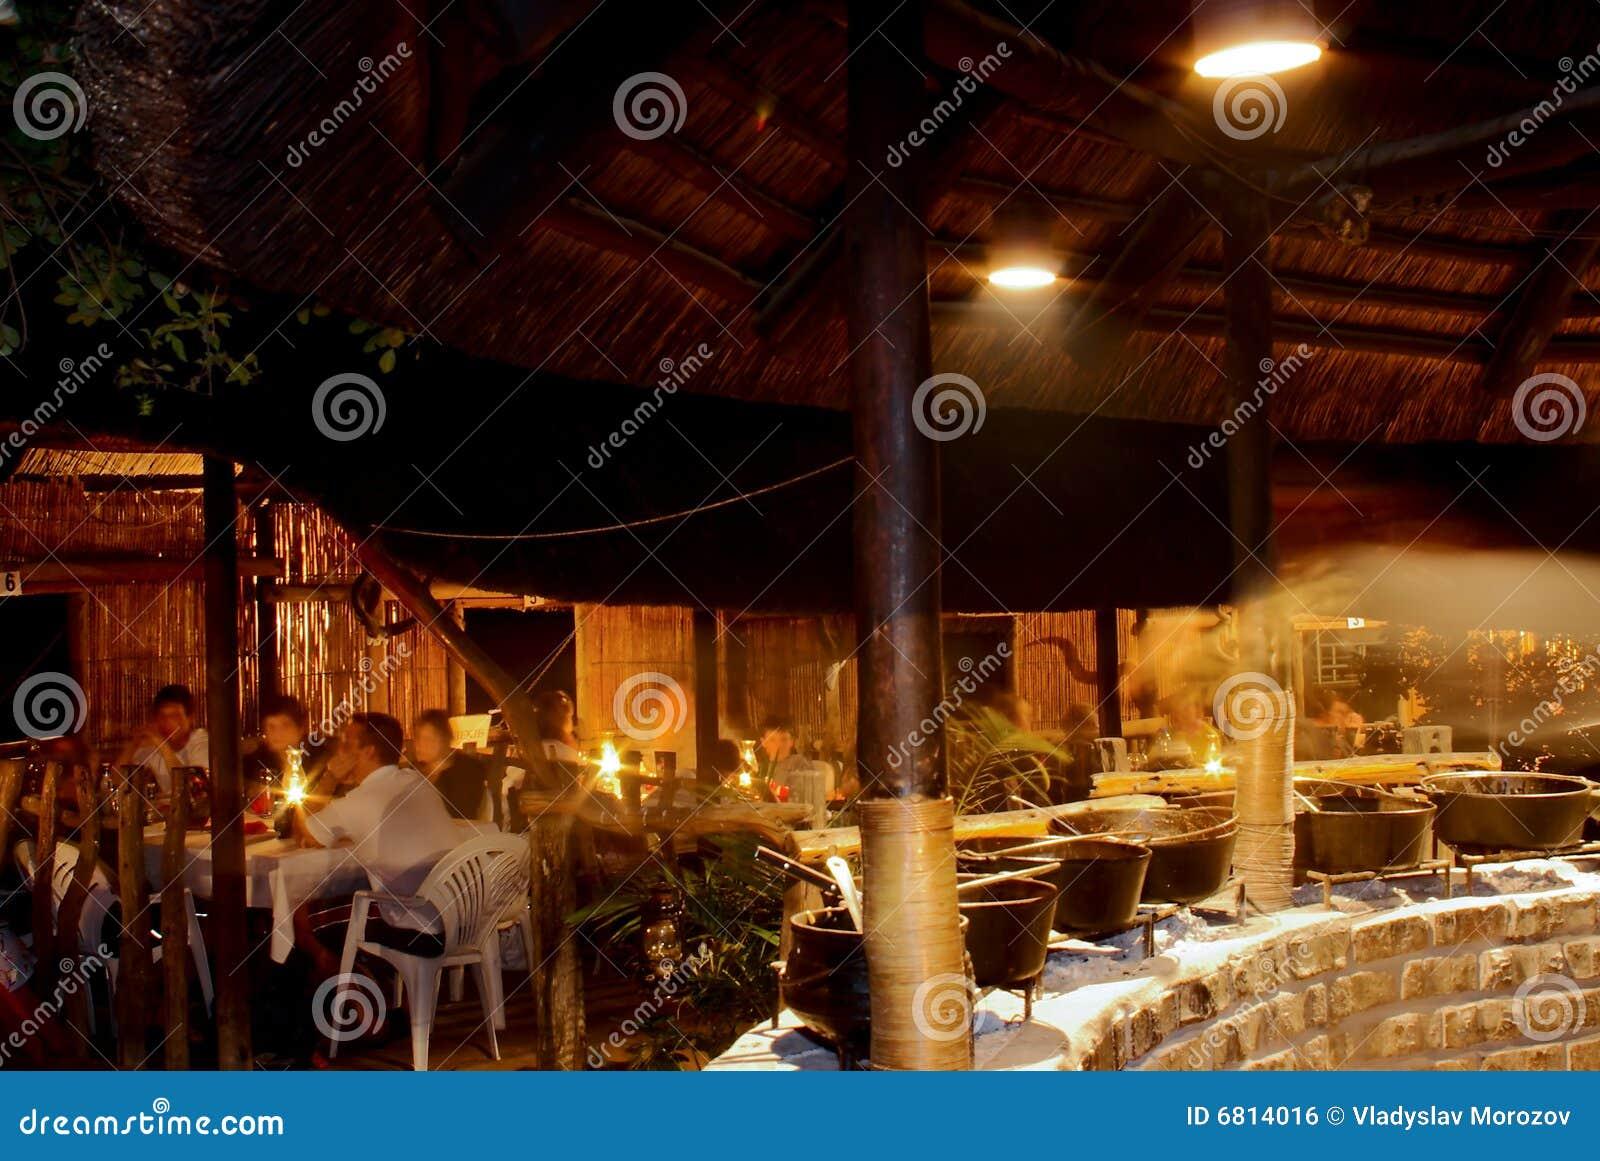 Open air safari restaurant interior at night royalty free